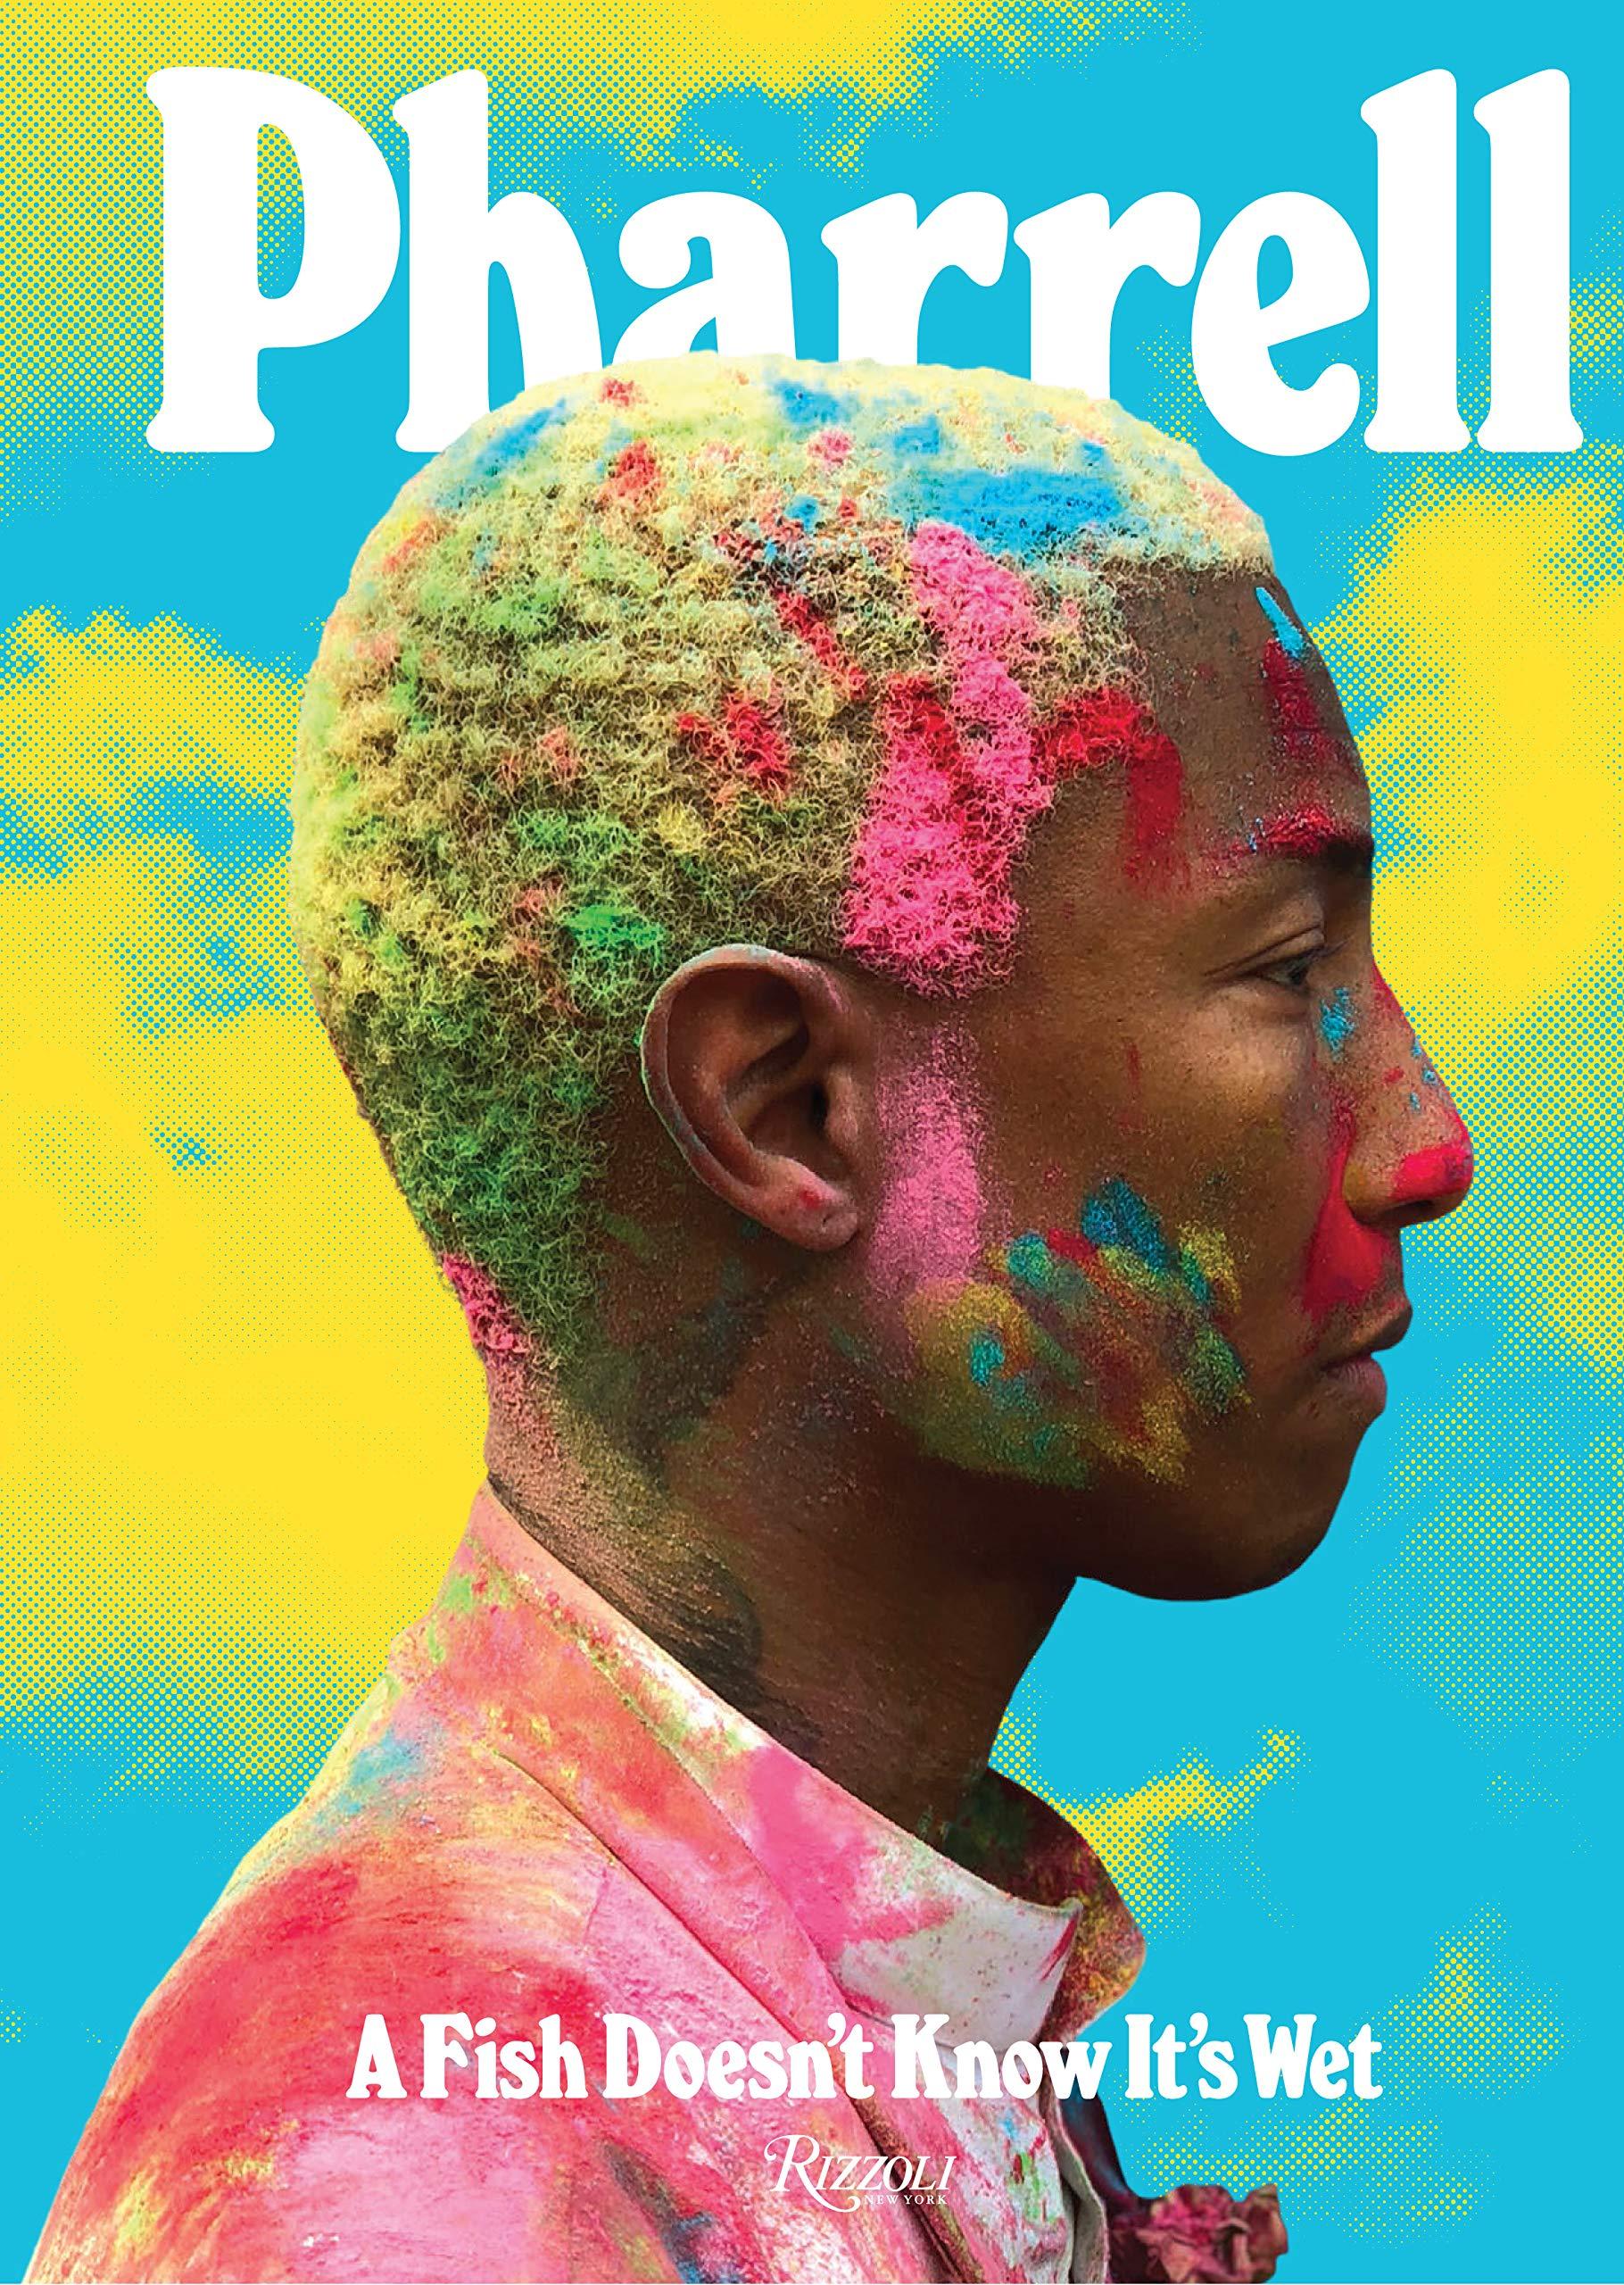 a037e3b52f3d2 Pharrell: A Fish Doesn't Know It's Wet: Pharrell Williams, Sarah ...